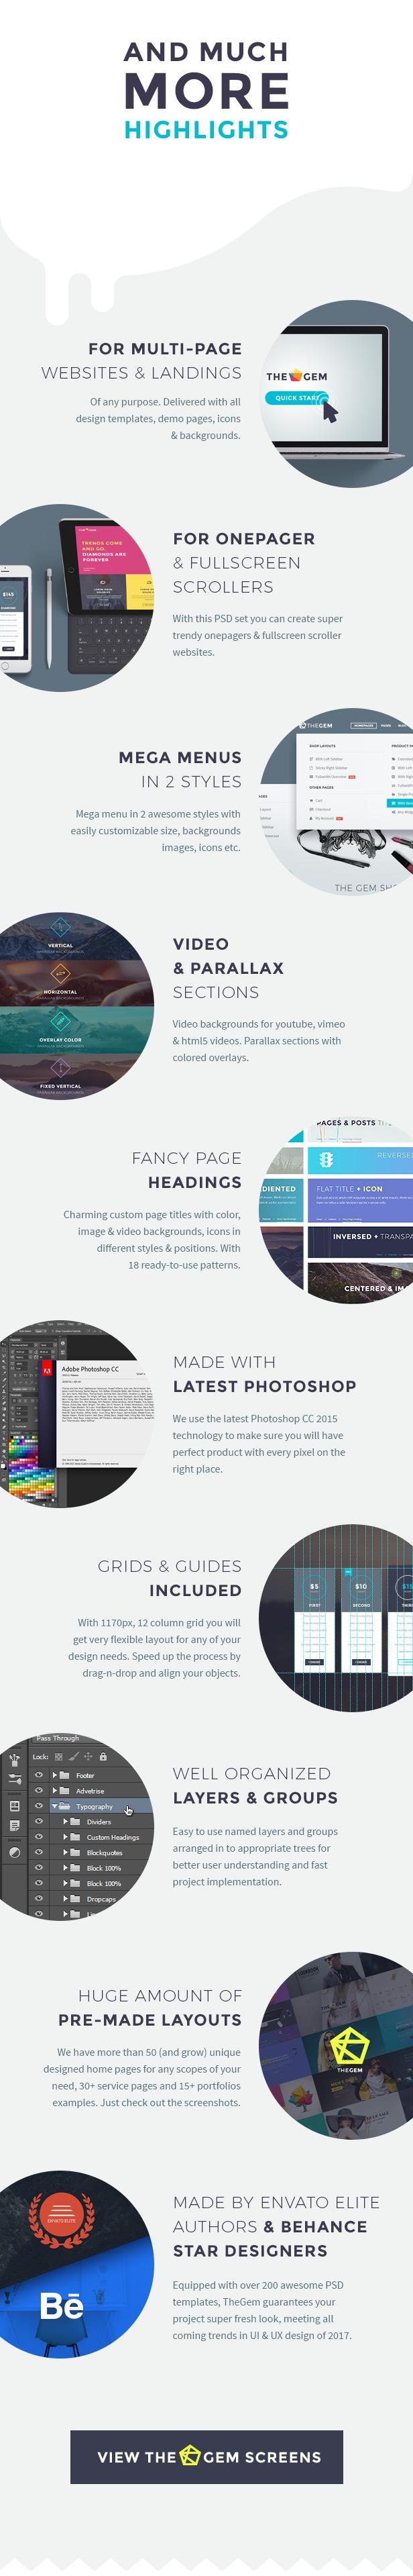 TheGem - Creative Multi-Purpose PSD Template - 6